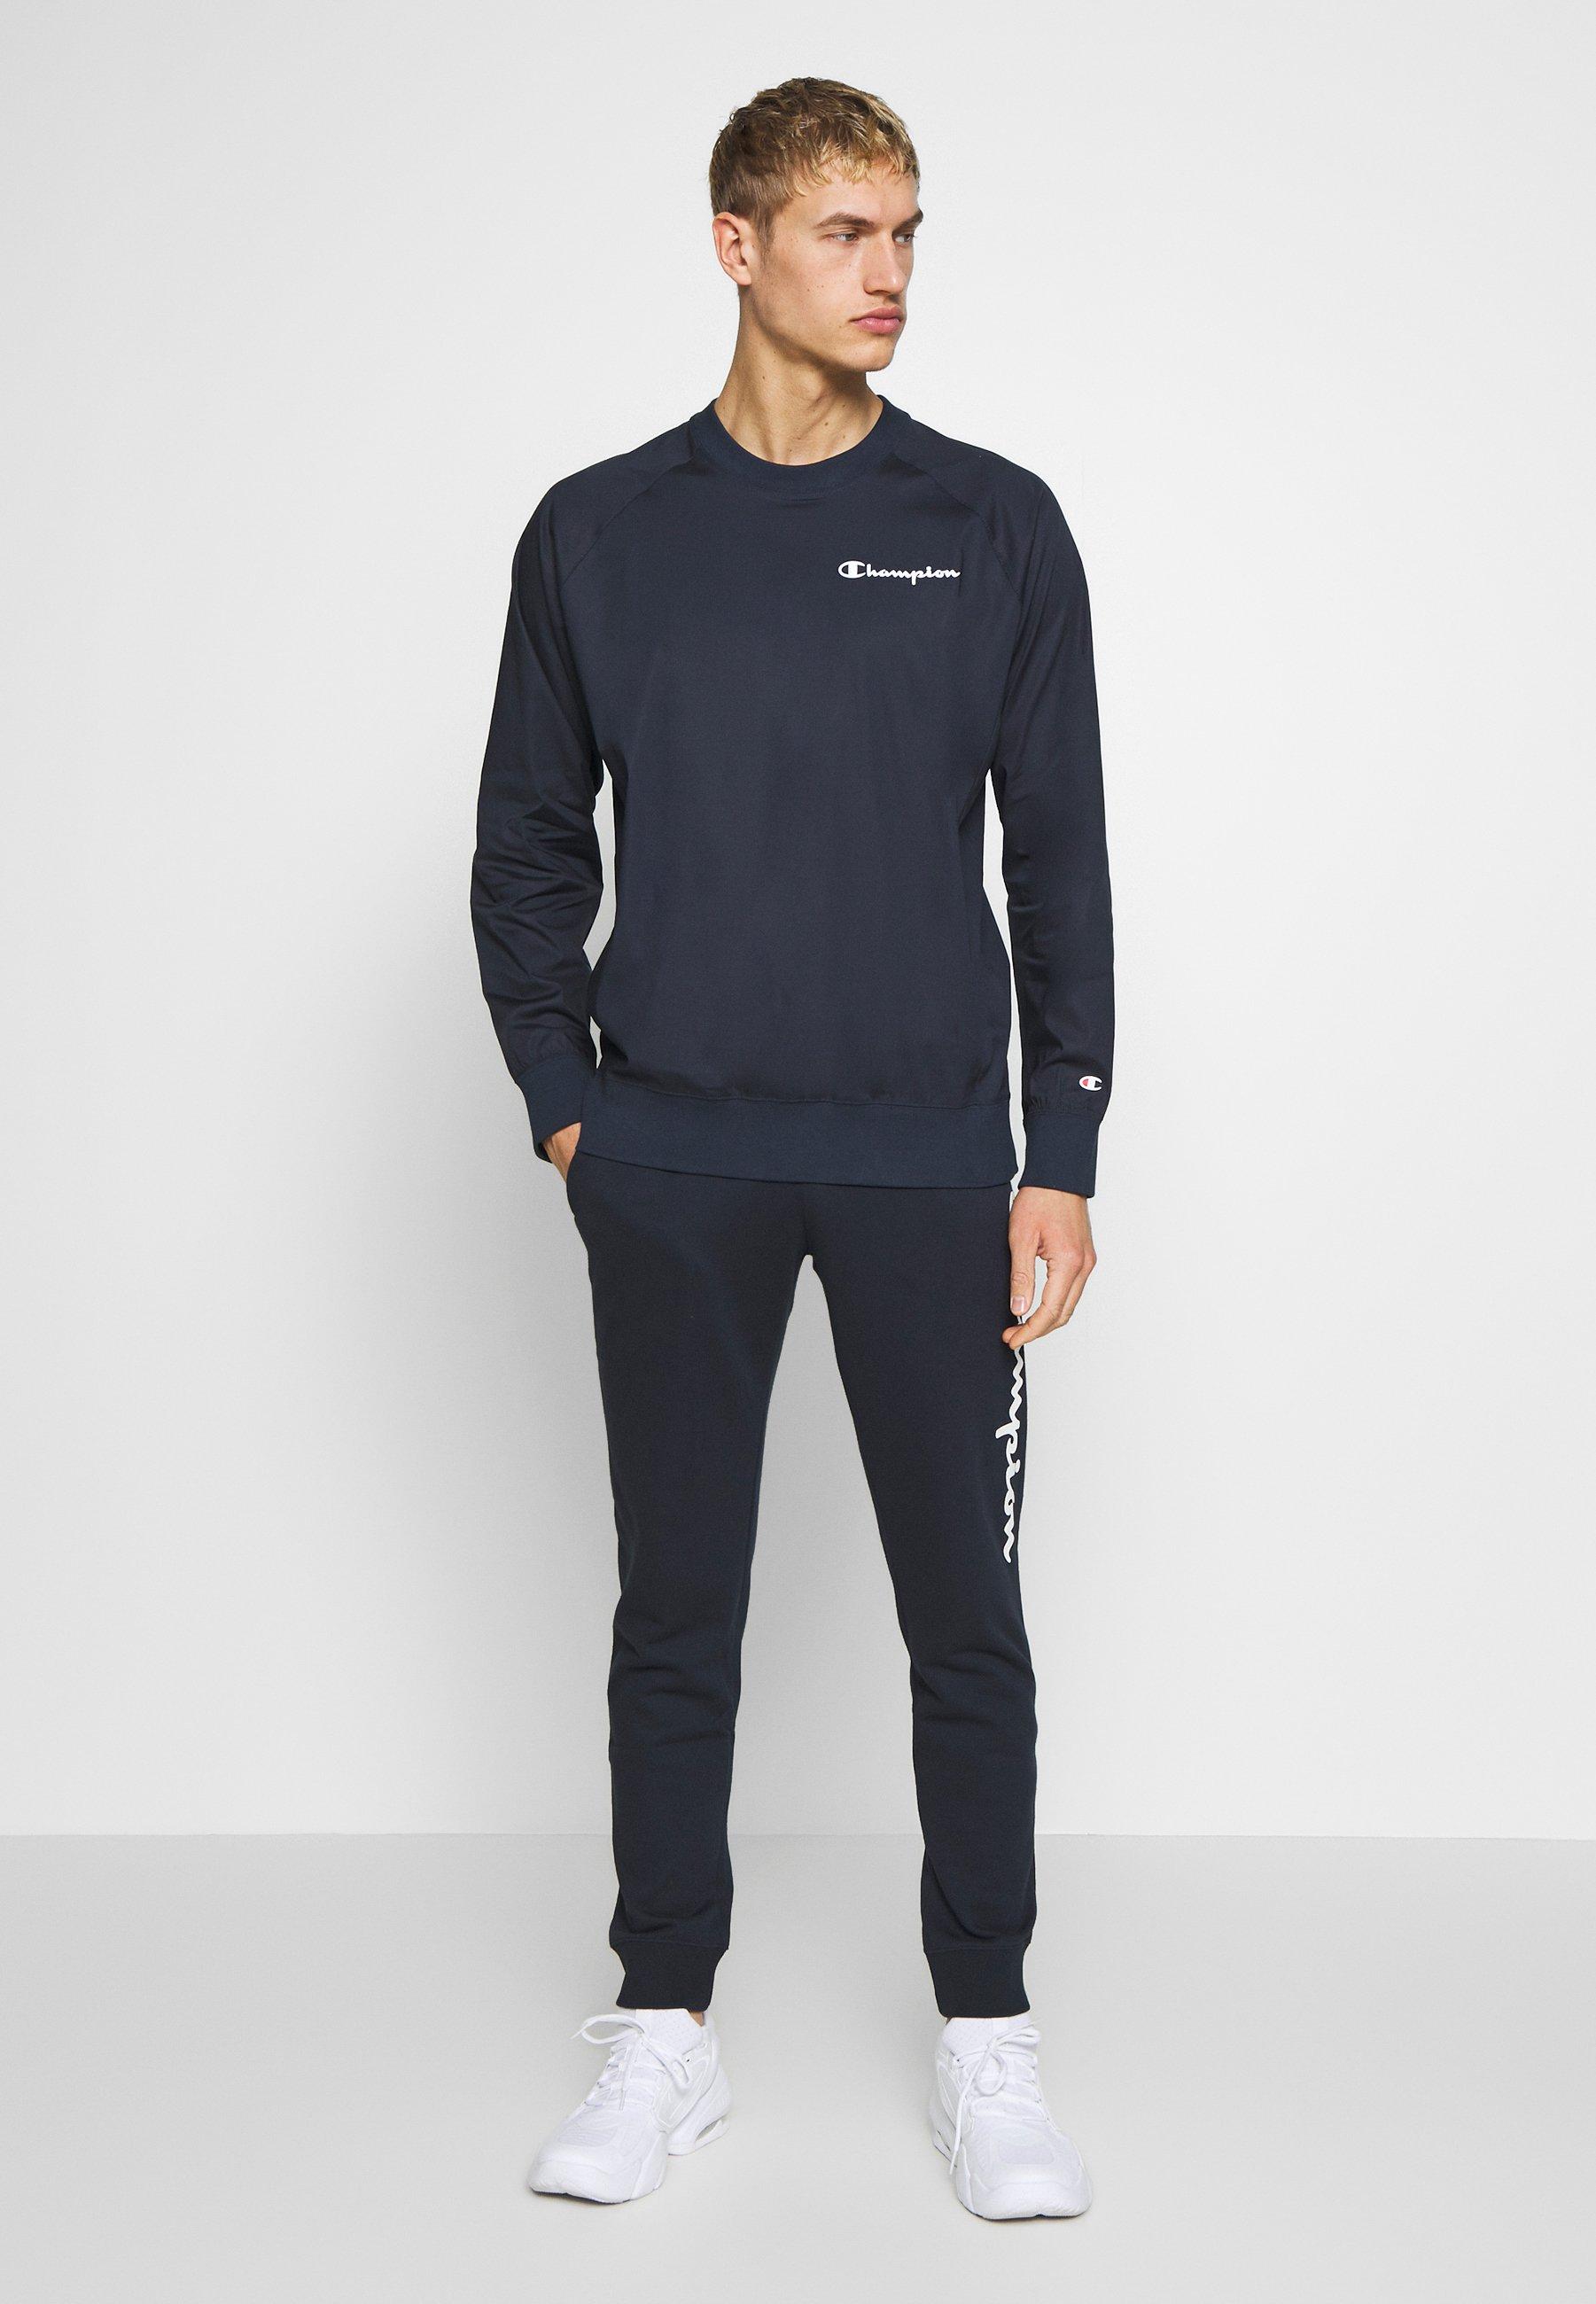 Champion Elastic Crewneck - Sweatshirt Dark Blue